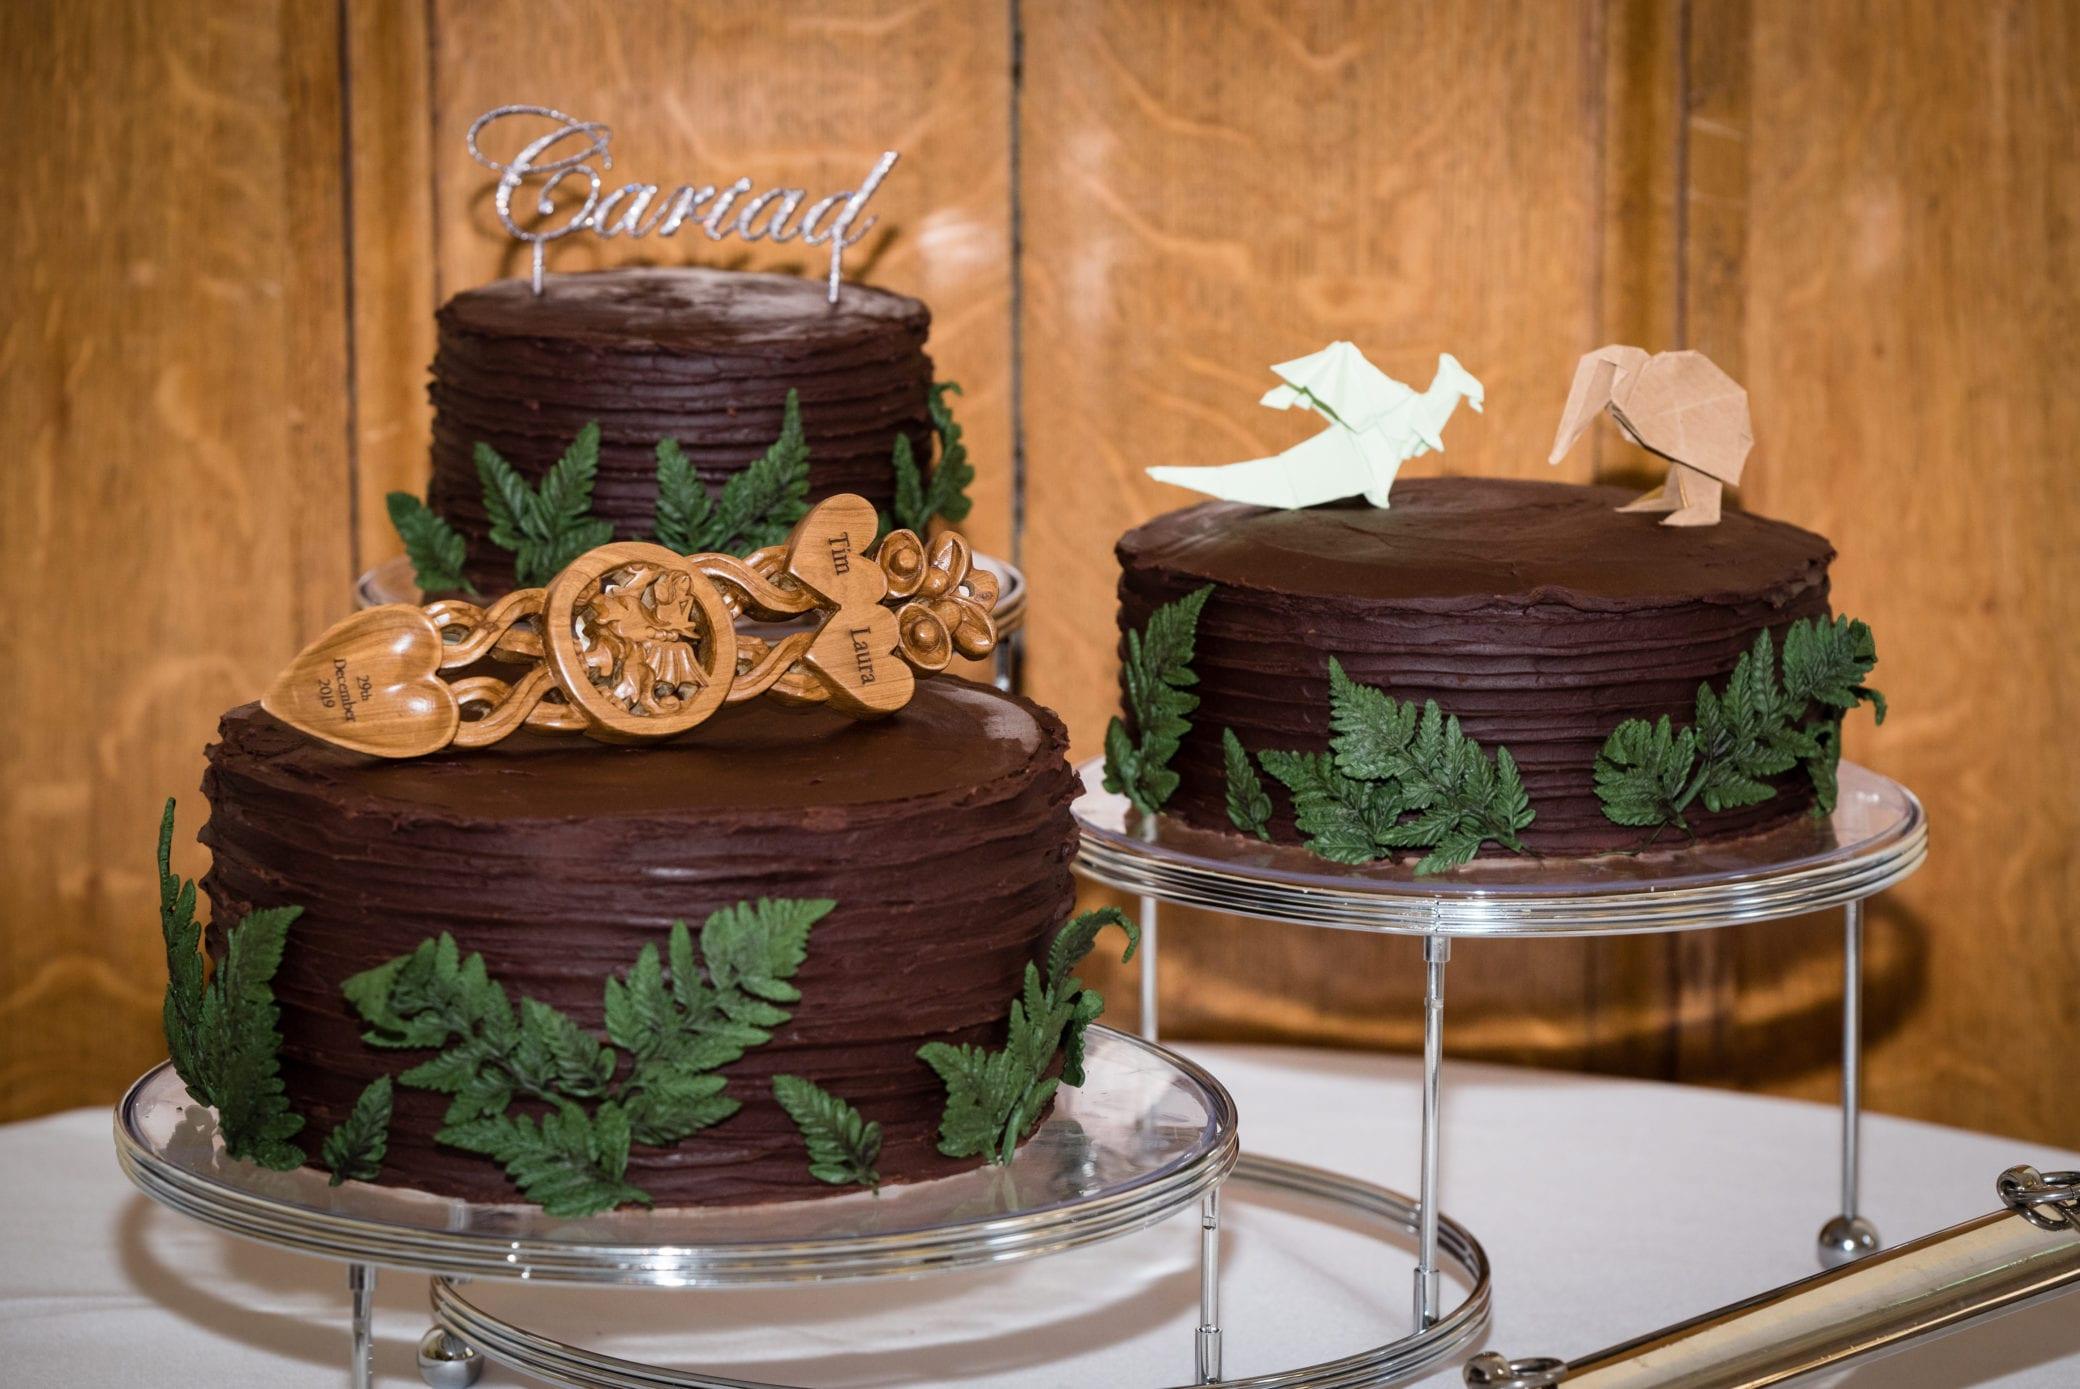 Chocolate wedding cake ideas at Farnham Castle in Surrey